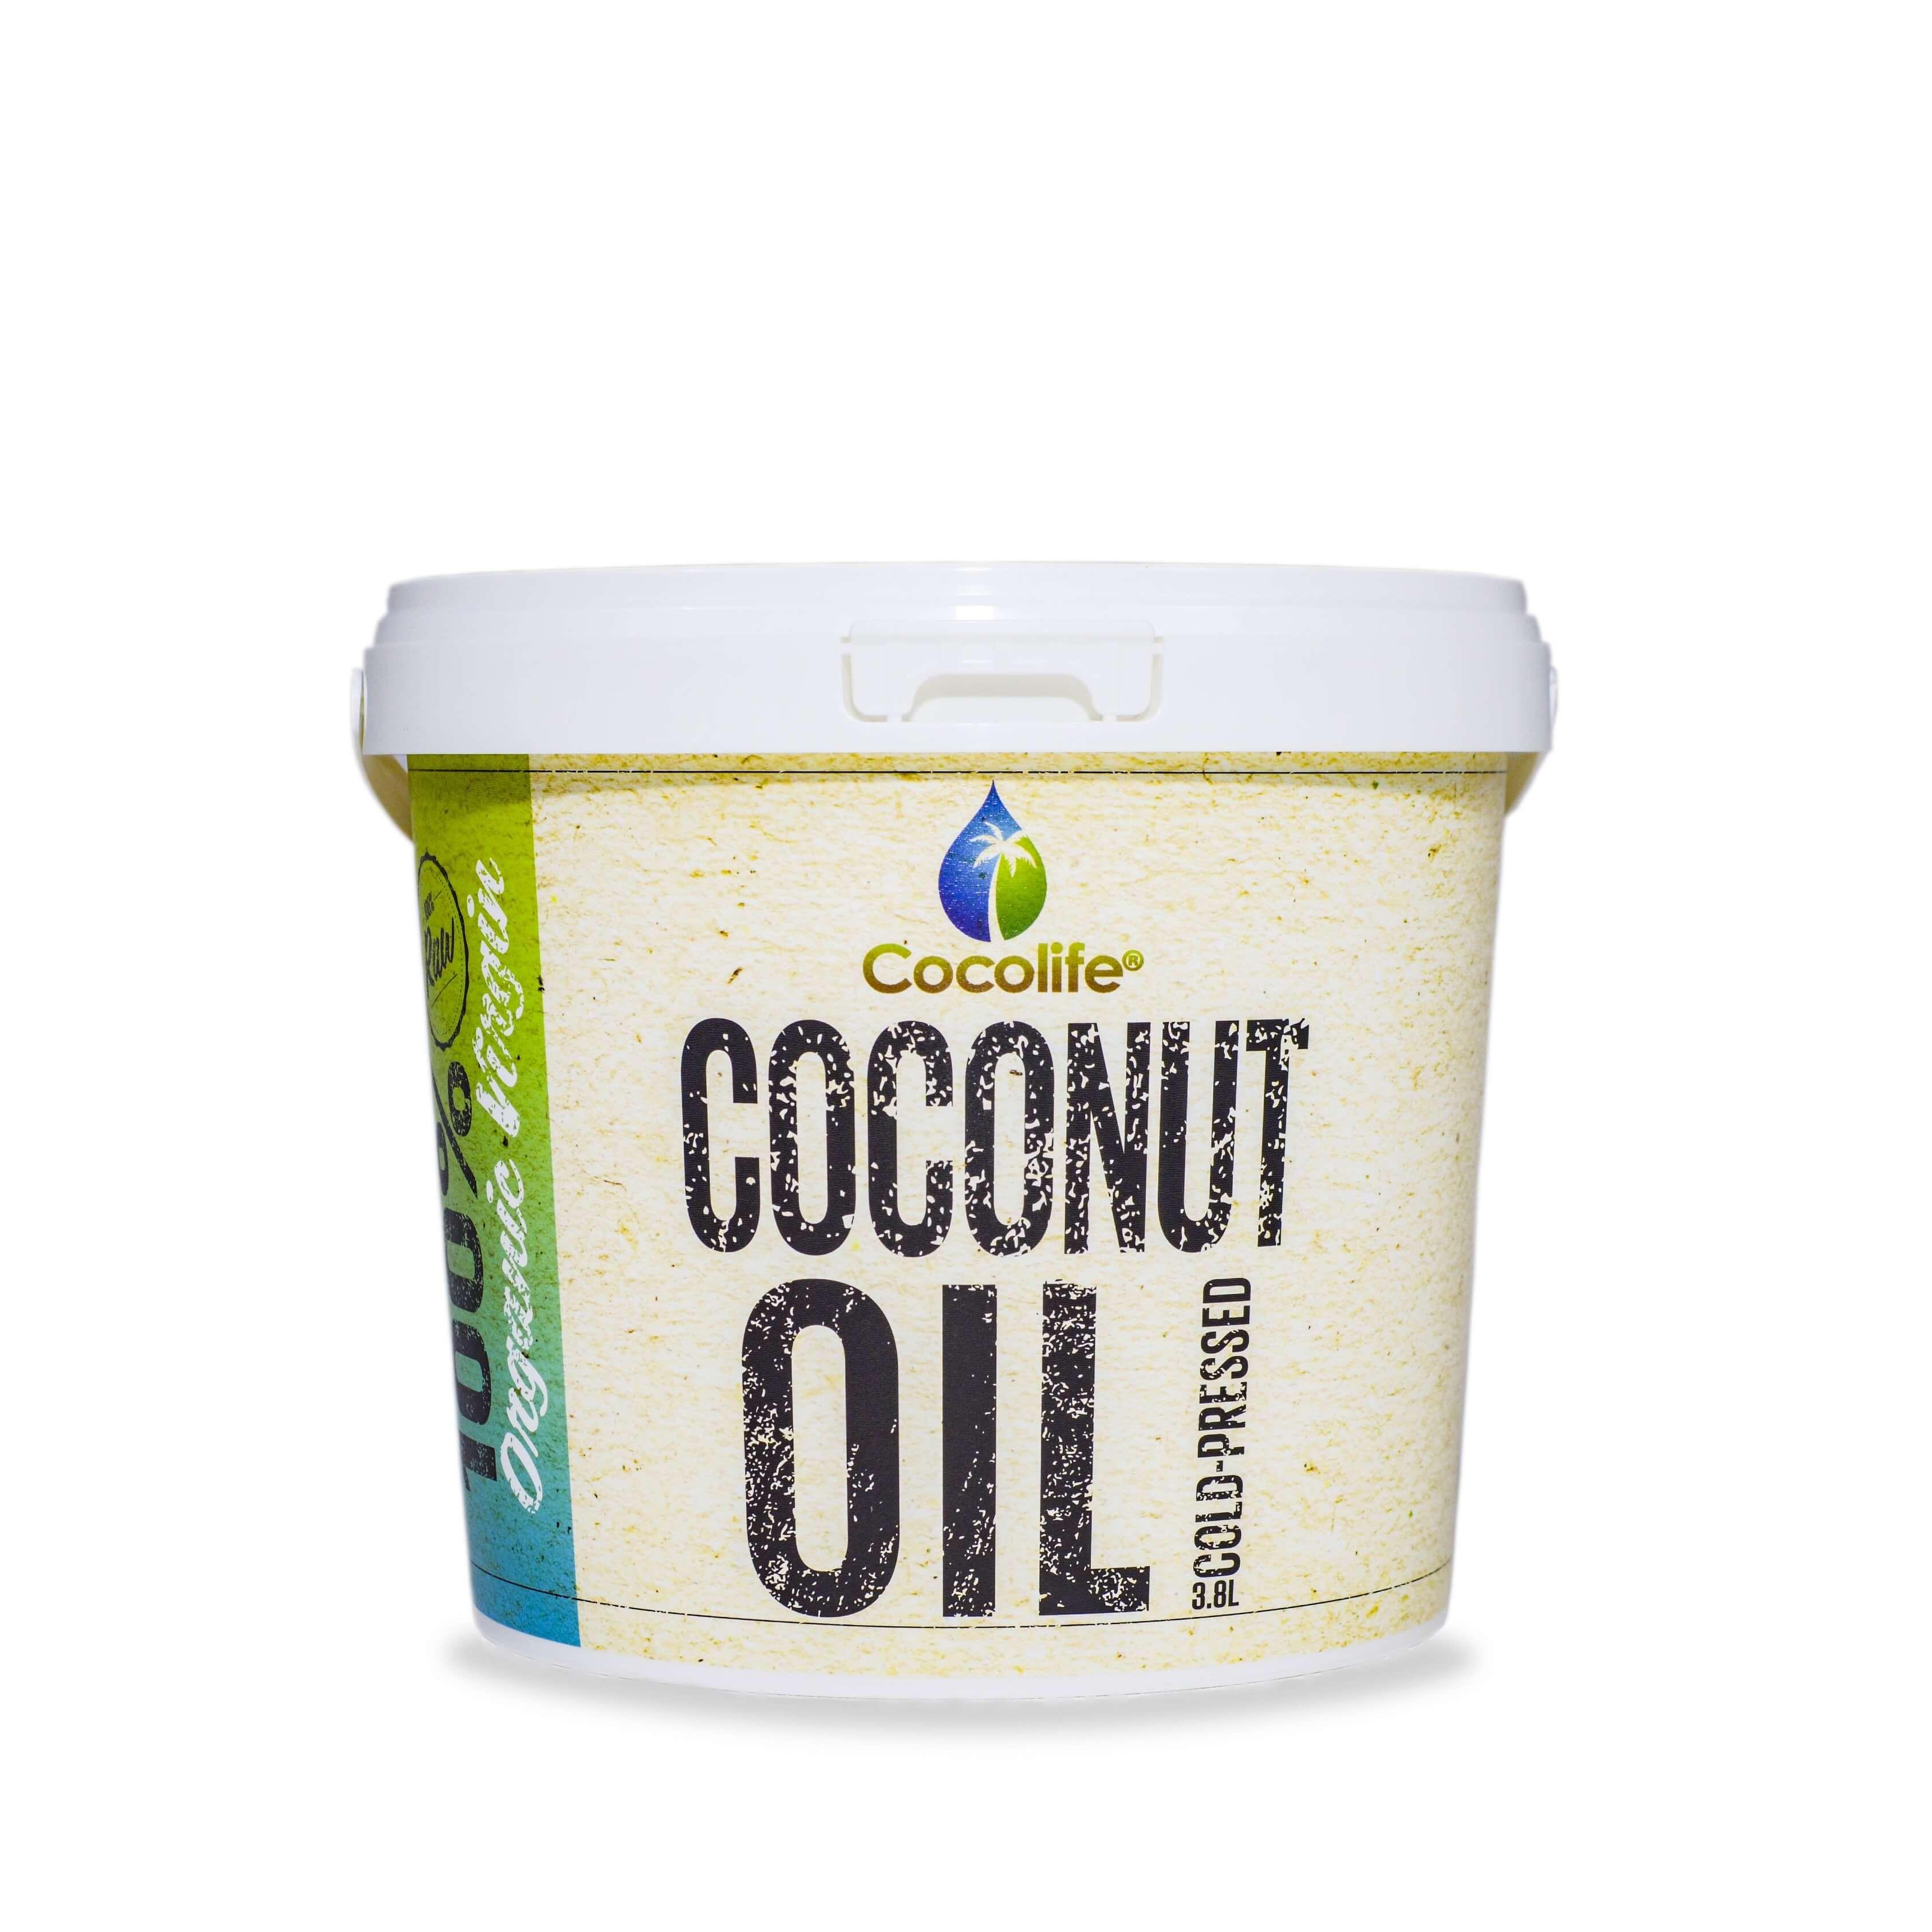 Organic Virgin Coconut Oil 3.8L Bulk Tub - Cocolife